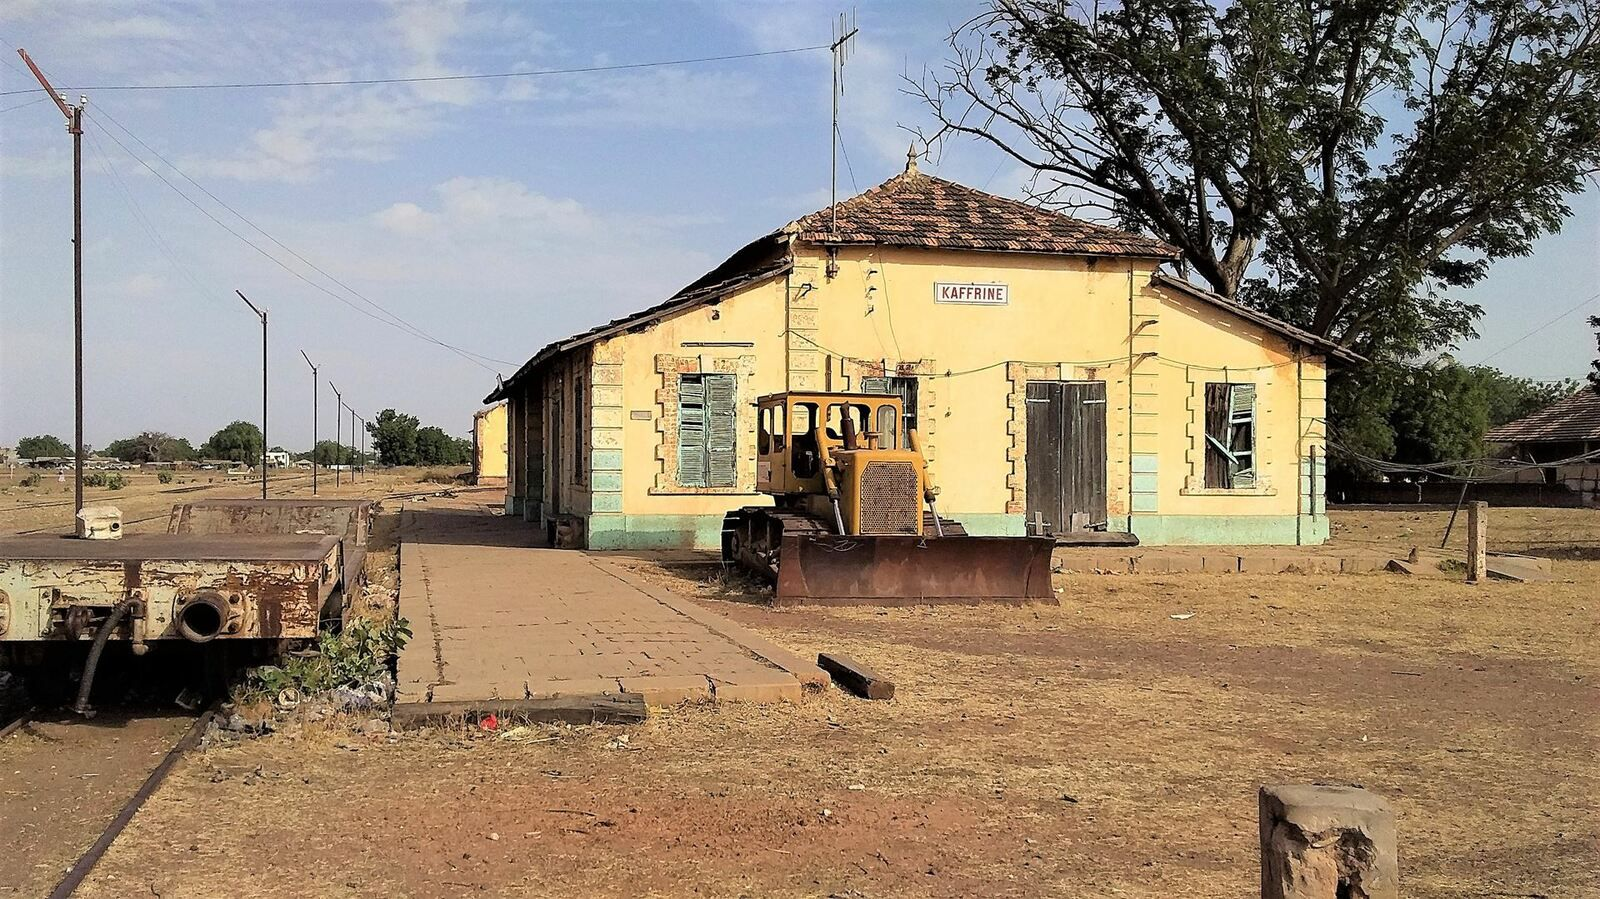 Gare de Kaffrine sur le rail Dakar - Koulikoro